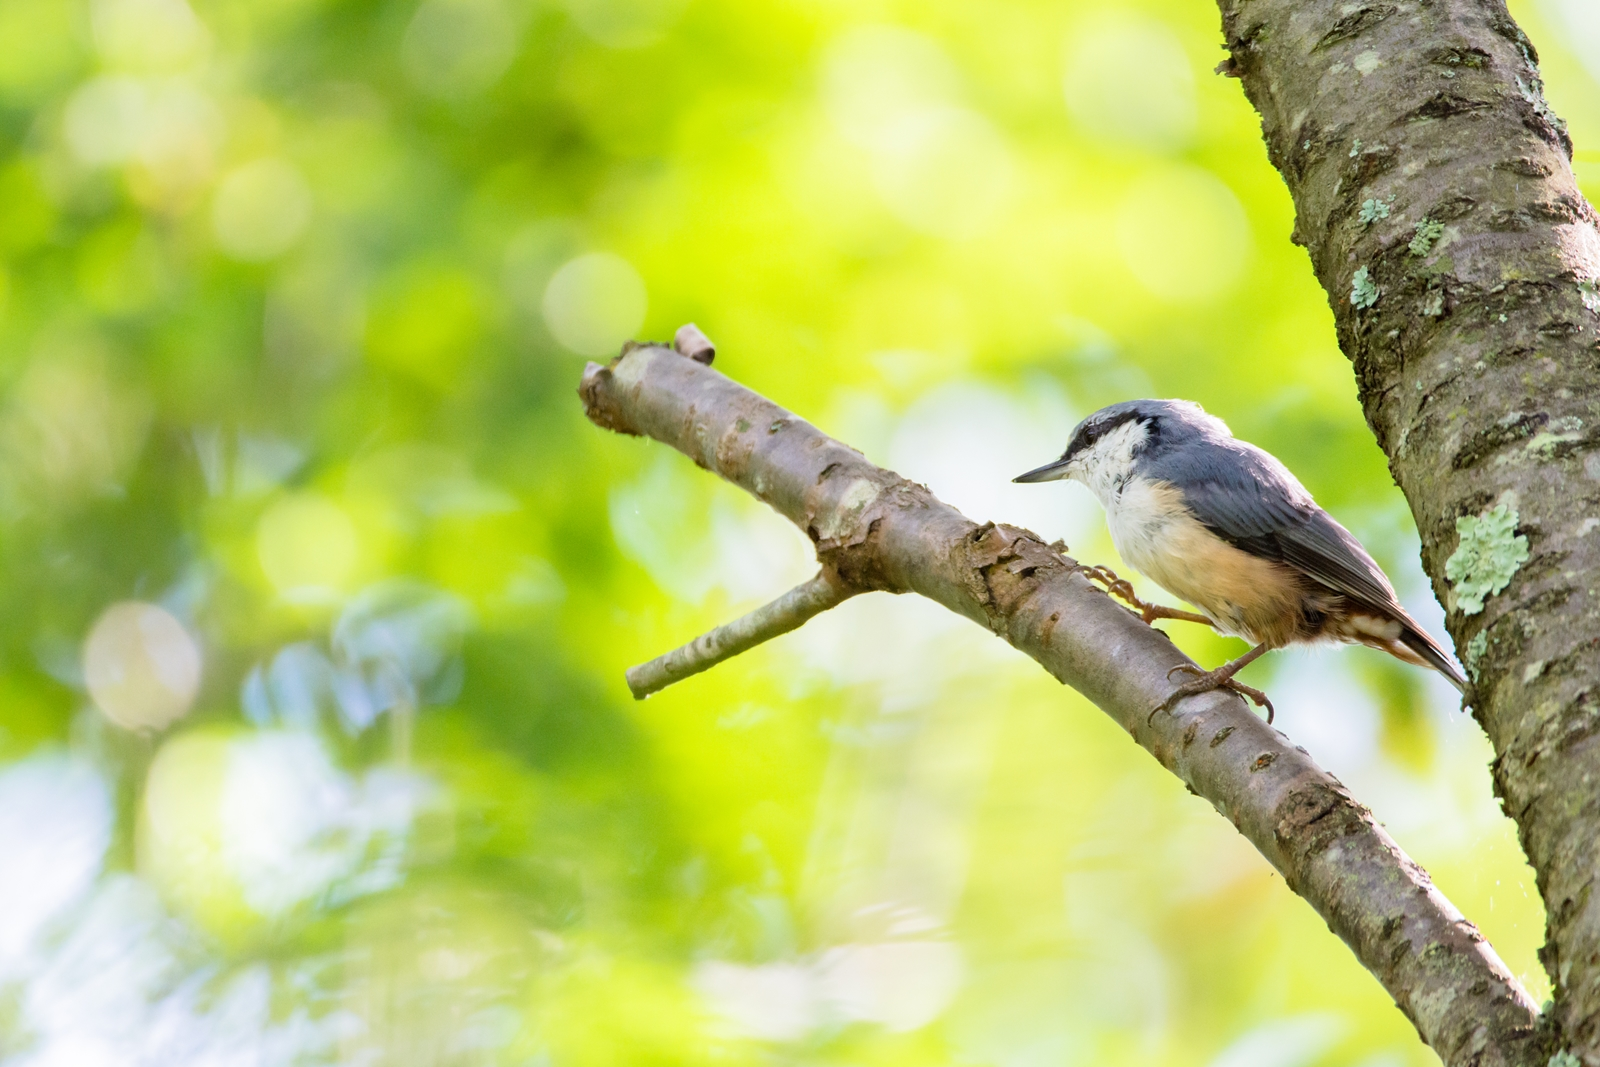 Photo: 先を見る Forward looking.  ふと足を止め 先を見据える 同じようで同じでない 小さな変化が 時の流れを教えてくれる  Eurasian nuthatch. (ゴジュウカラ)  #birdphotography #birds #cooljapan #kawaii #nikon #sigma  Nikon D7200 SIGMA 150-600mm F5-6.3 DG OS HSM Contemporary